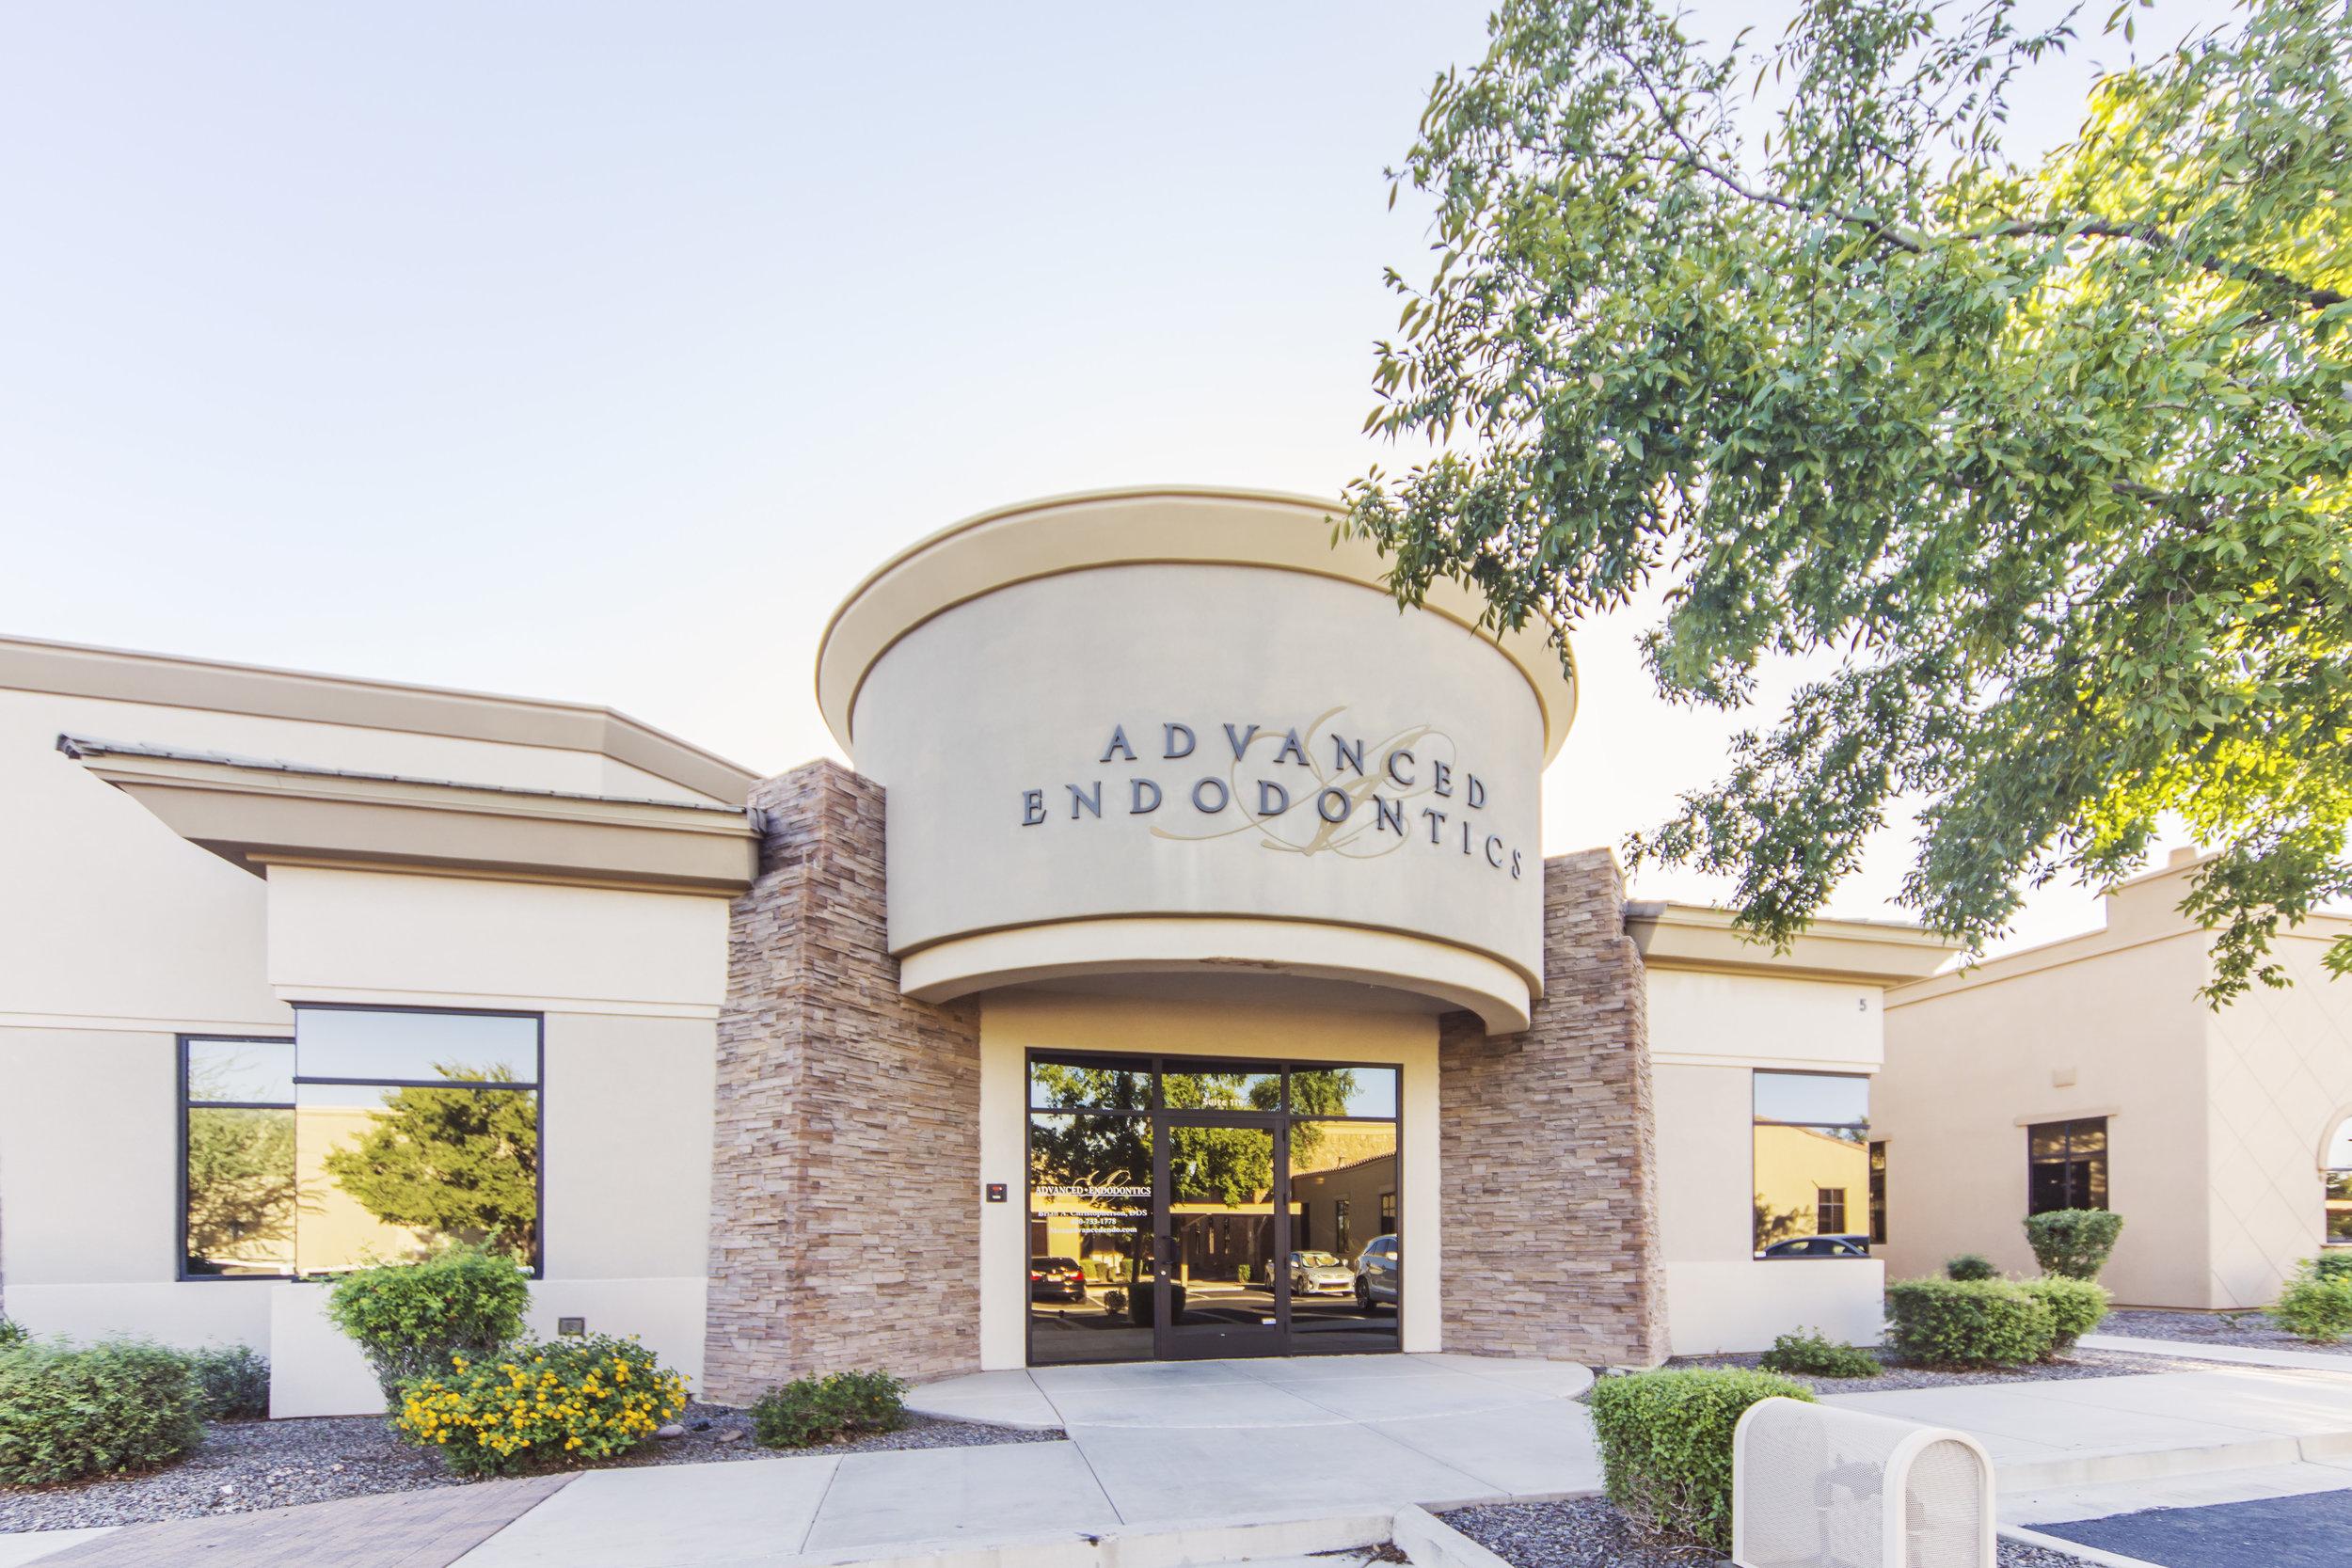 Advanced Endodontics Office-Jessica Bowles-4550.jpg